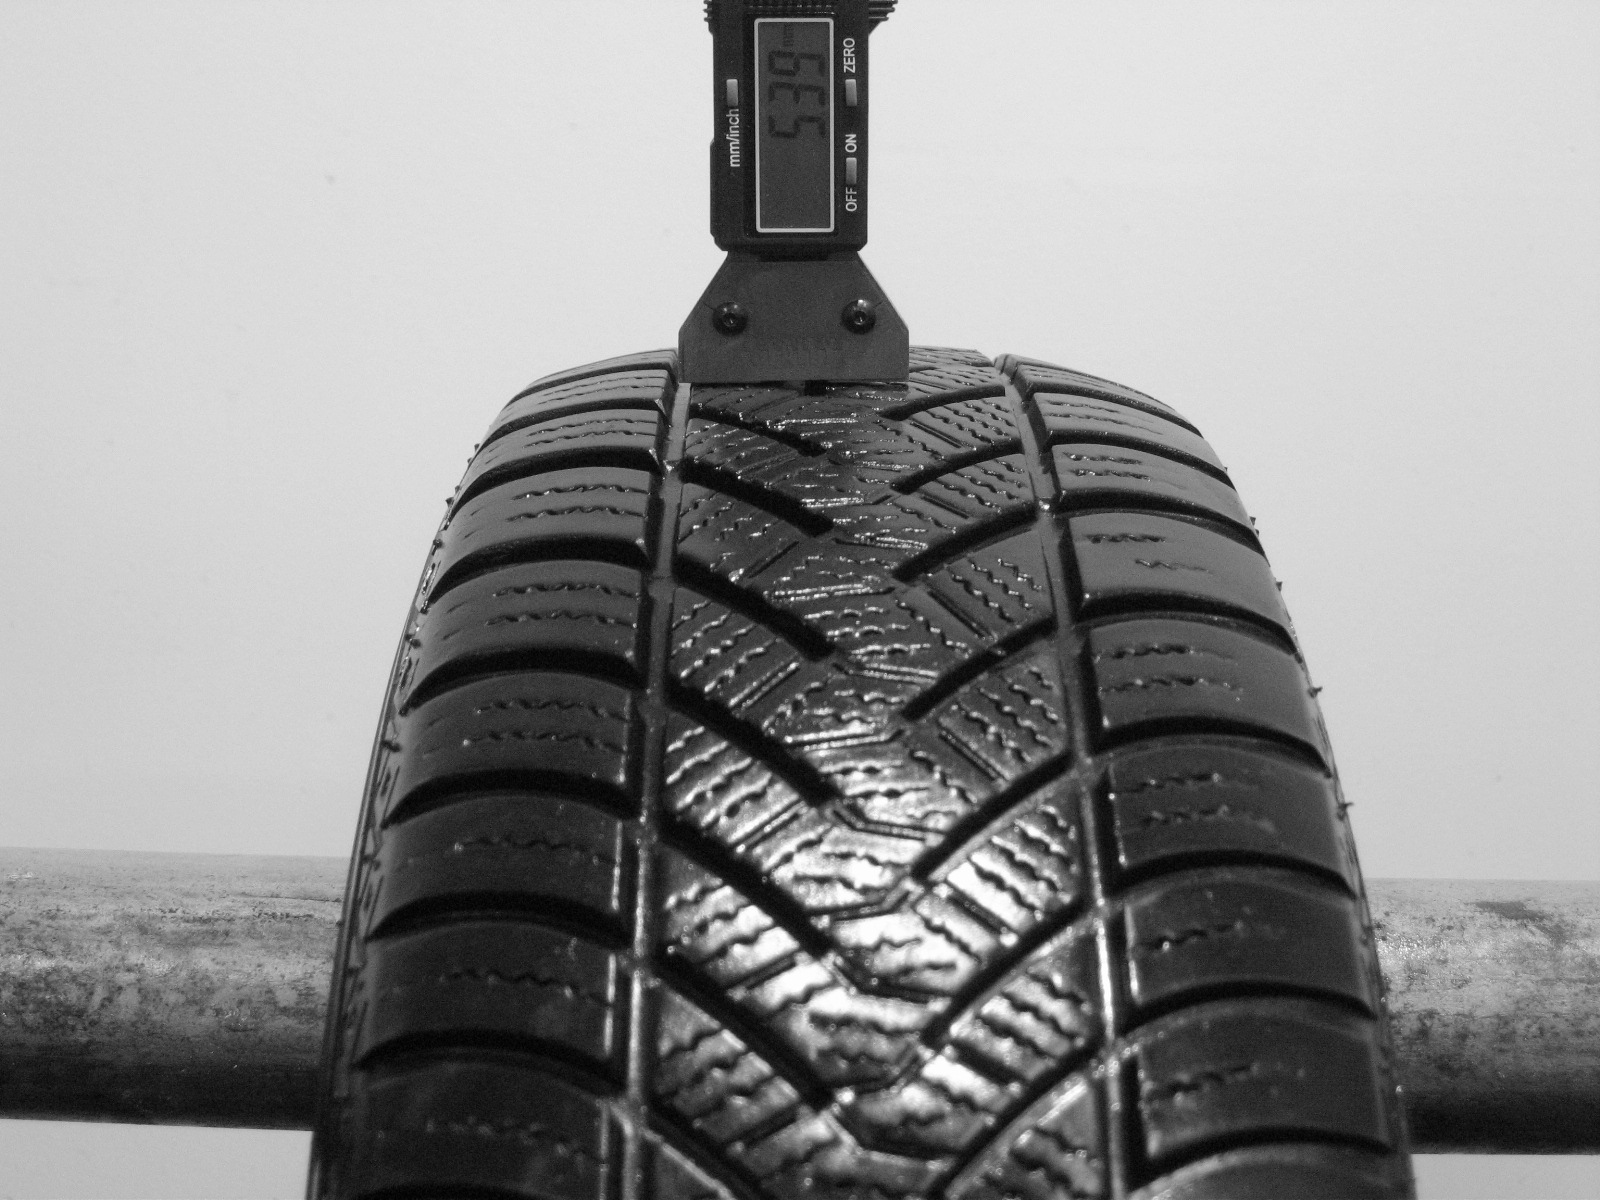 Použité-Pneu-Bazar - 175/65 R14 MAXXIS ALL SEASON AP2-kusovka-rezerva 3mm